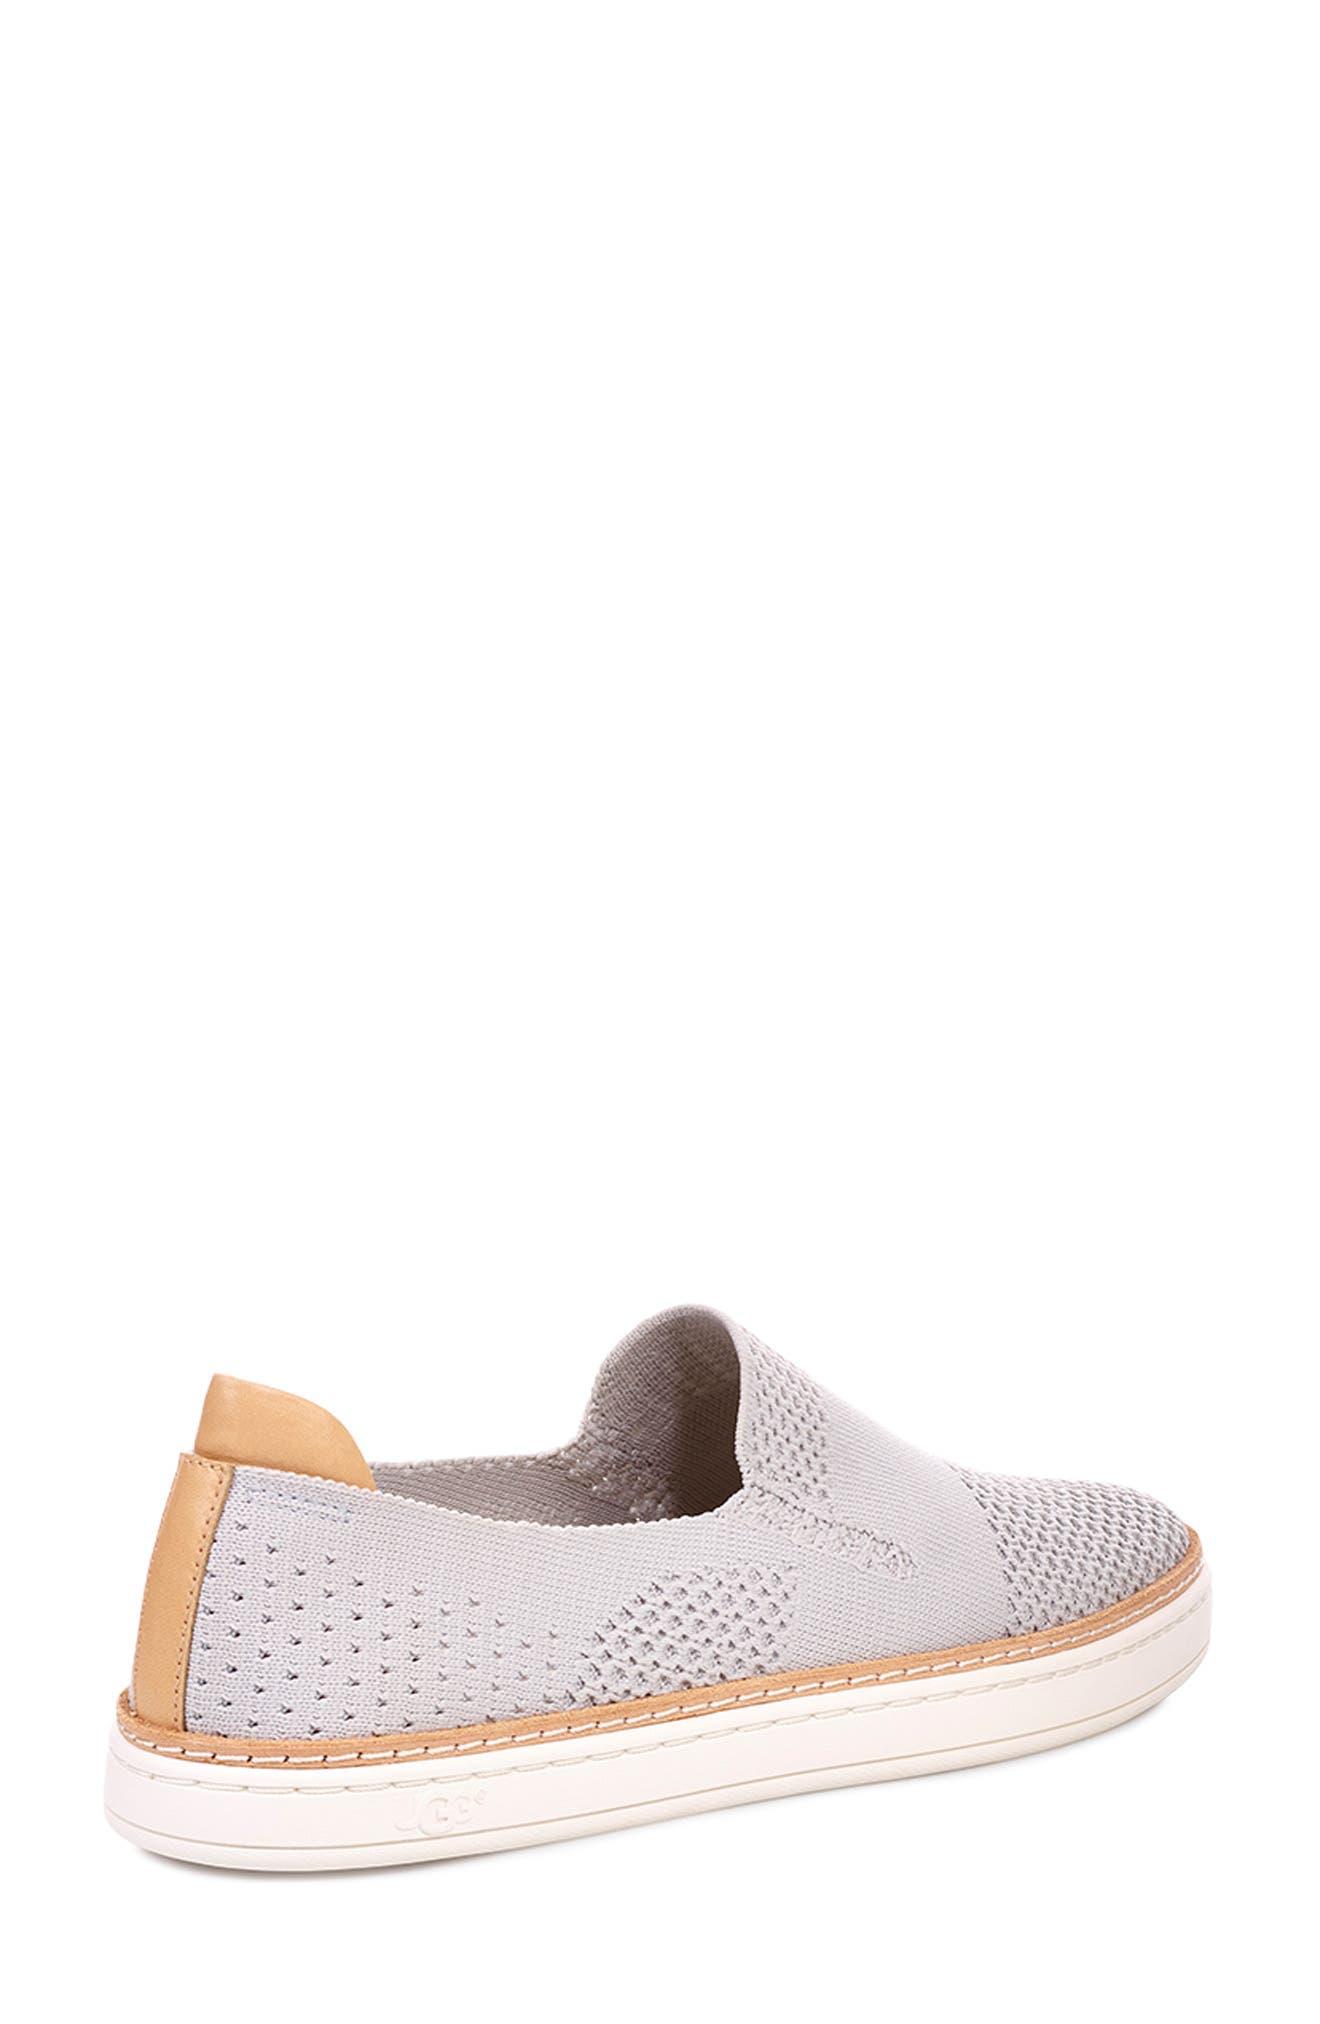 Sammy Sneaker,                             Alternate thumbnail 2, color,                             GREY VIOLET FABRIC